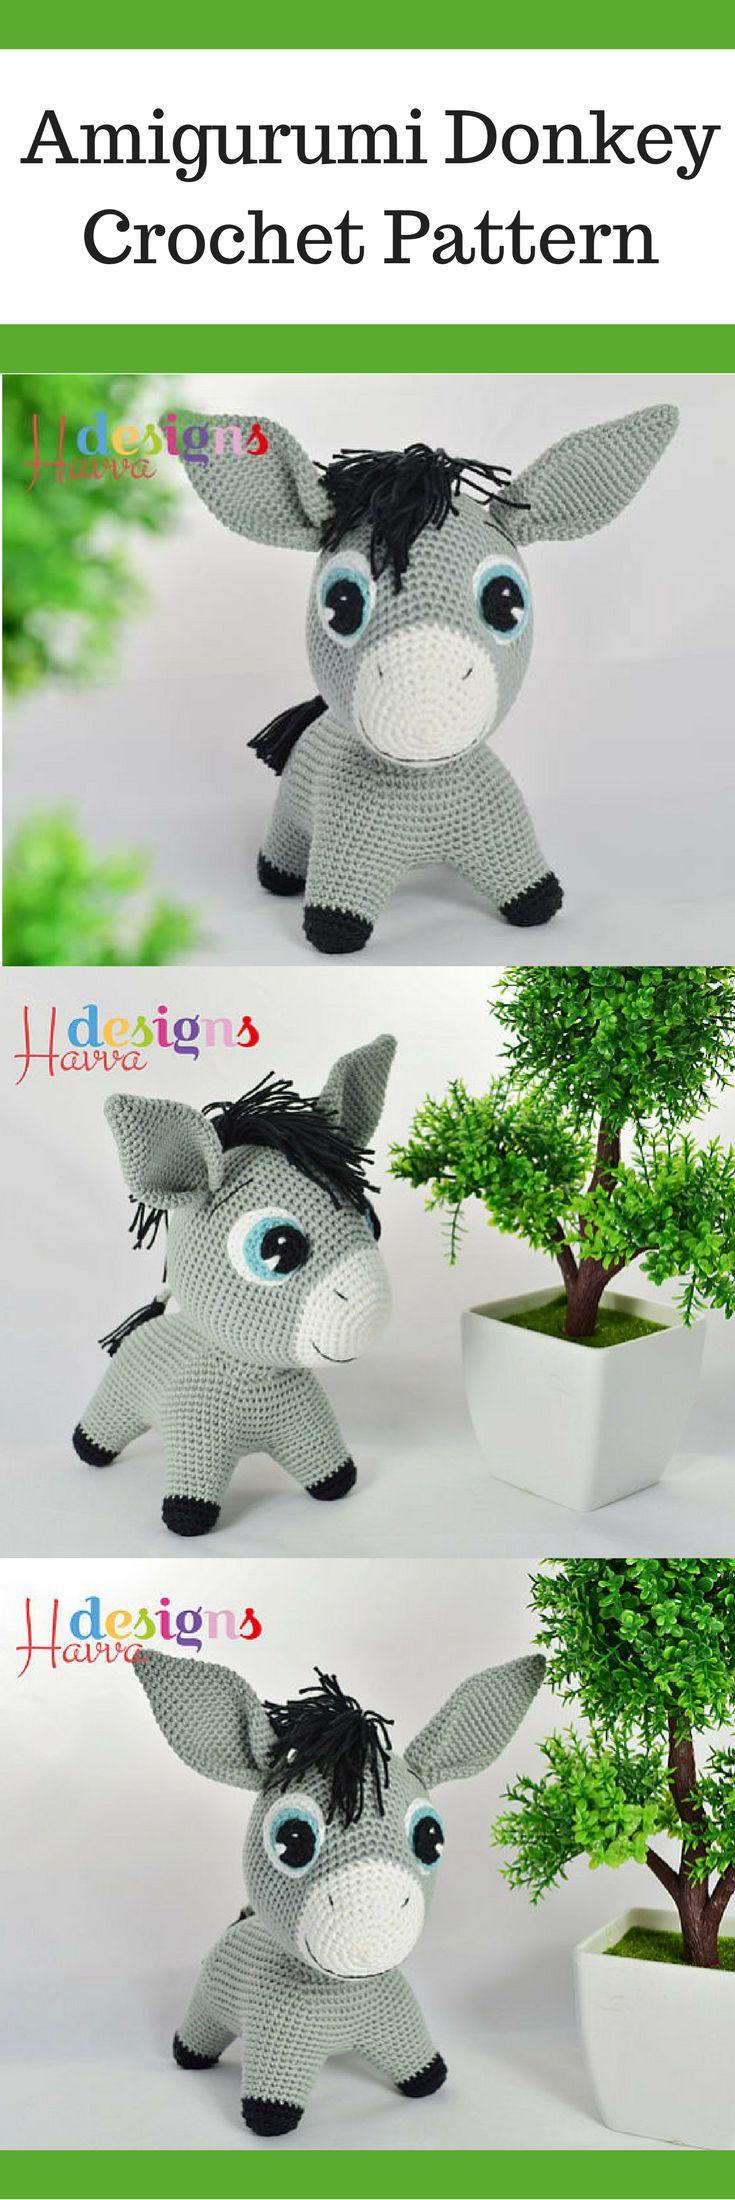 Amigurumi Donkey Crochet Pattern Printable #ad #amigurumi #amigurumidoll #amigur…